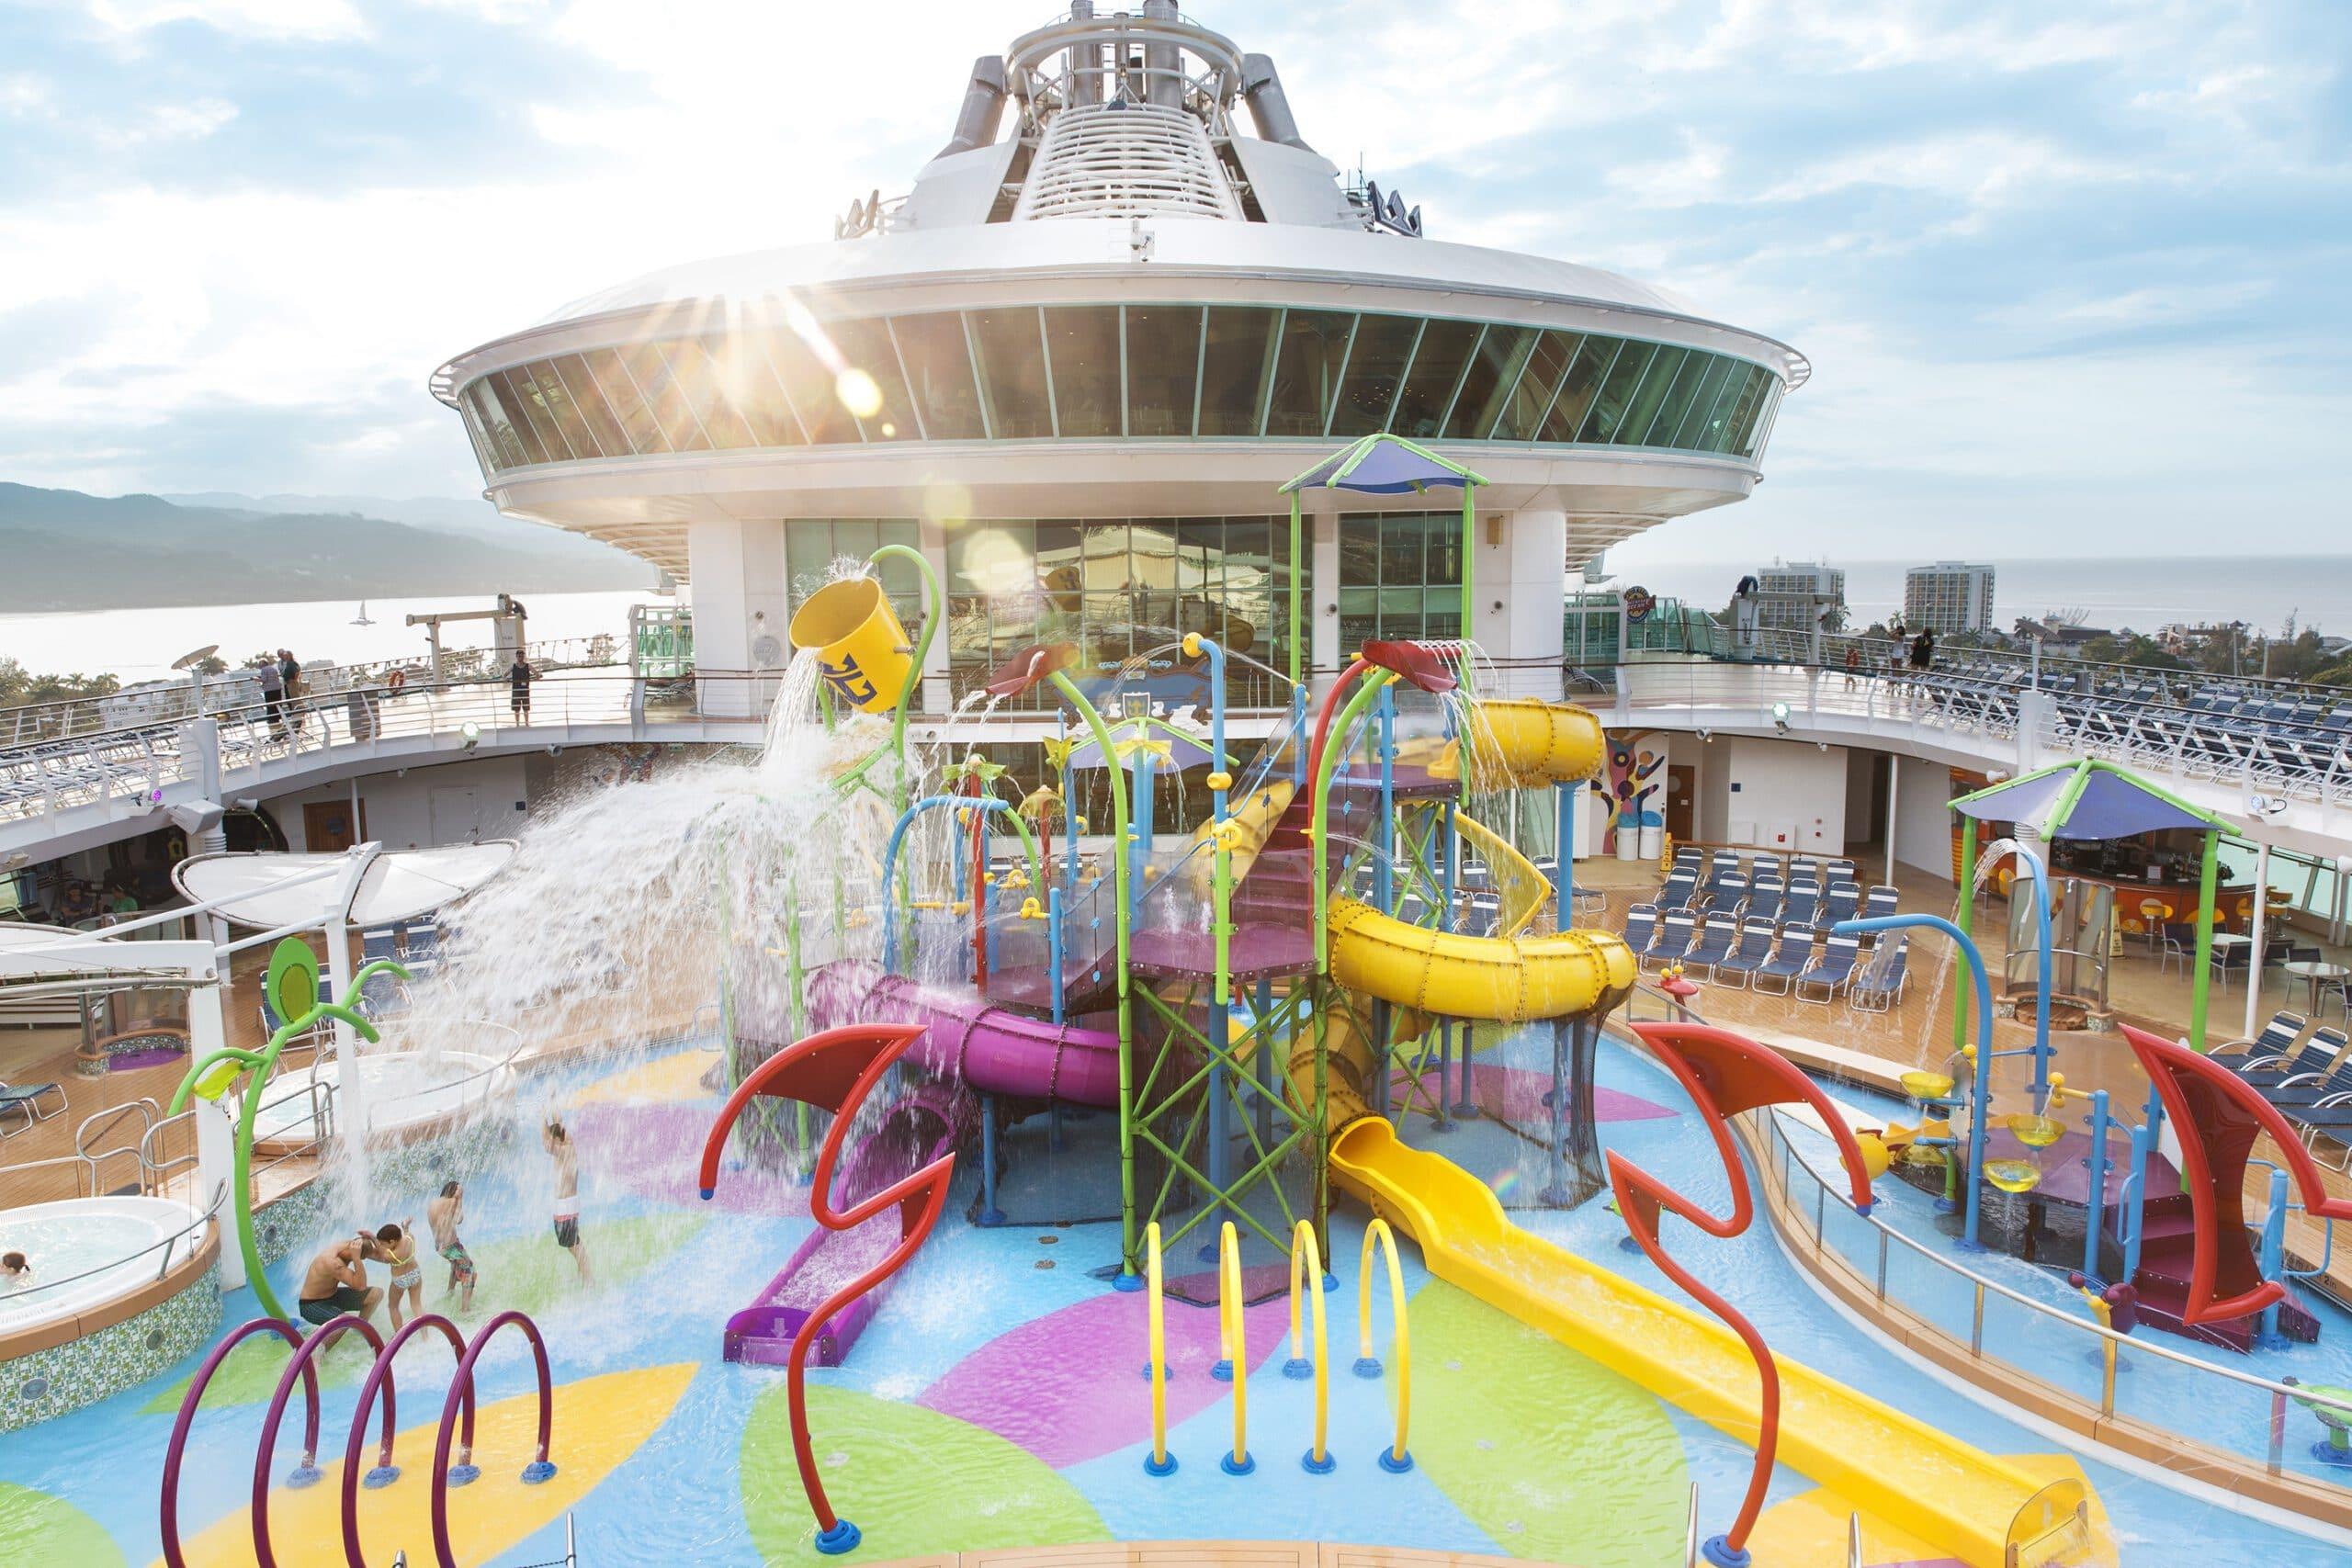 Cruiseschip-Liberty of the Seas-Royal Caribbean International-Splash Aquapark